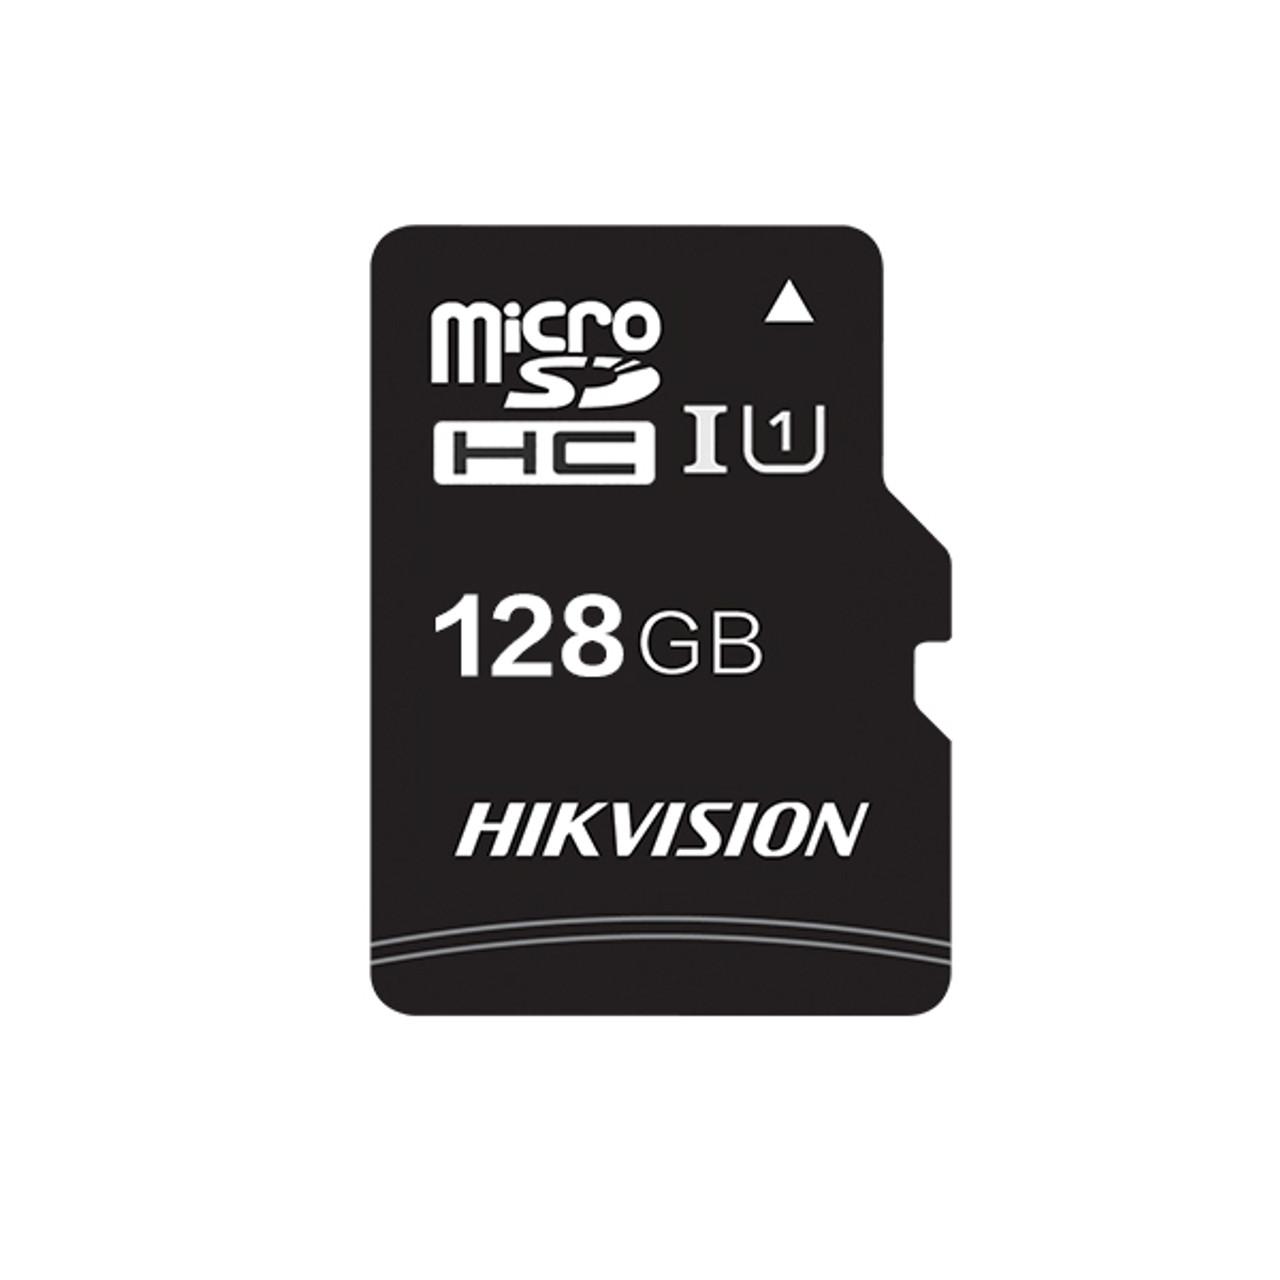 HIKVISION MicroSDHC™ 128GBHigh Performance